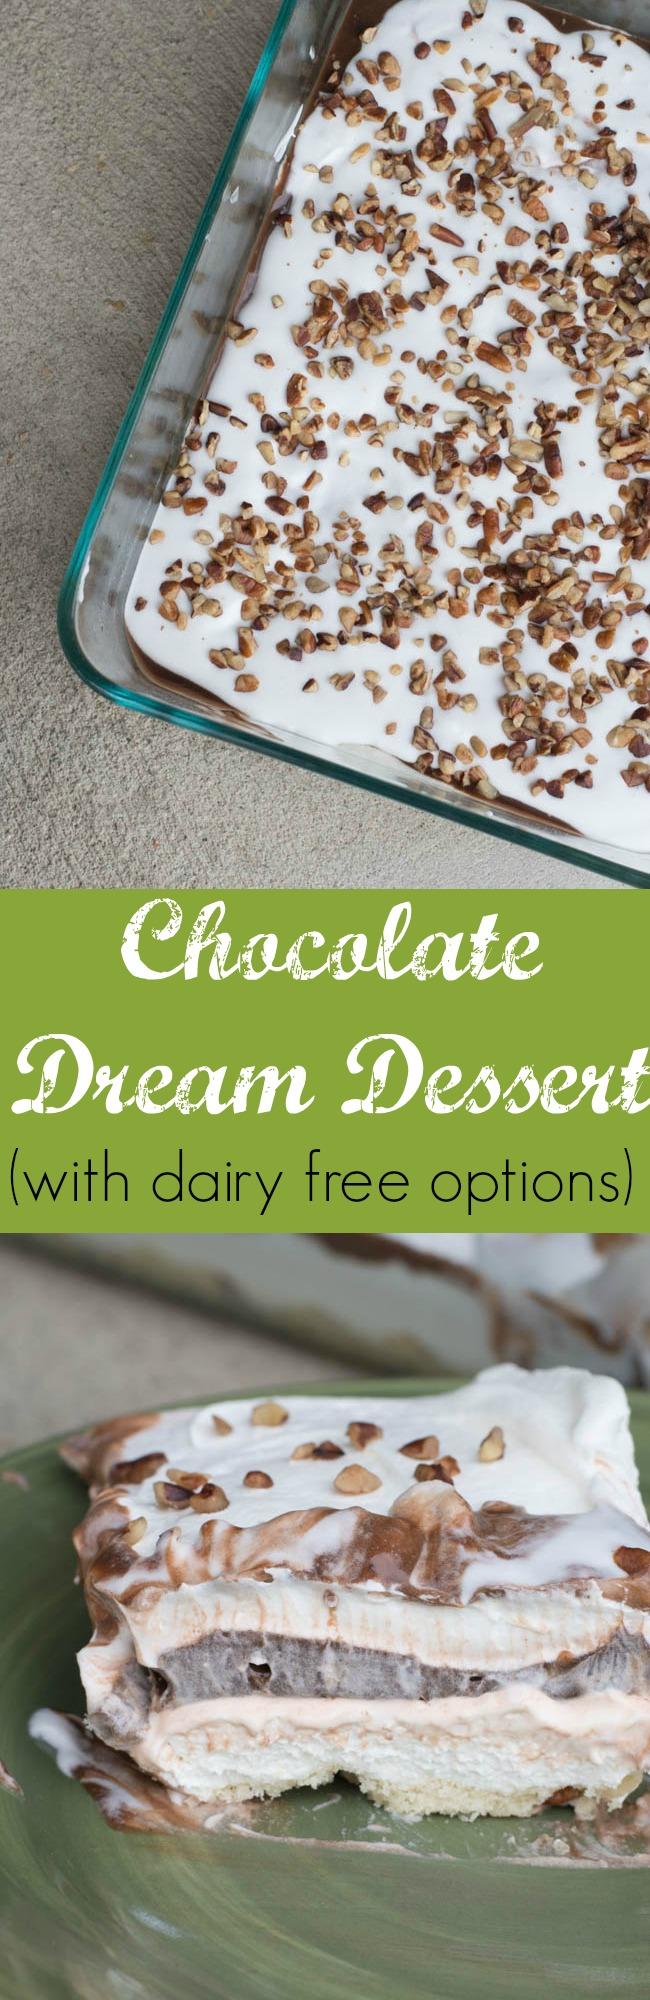 chocolate-dream-dessert-dairy-free